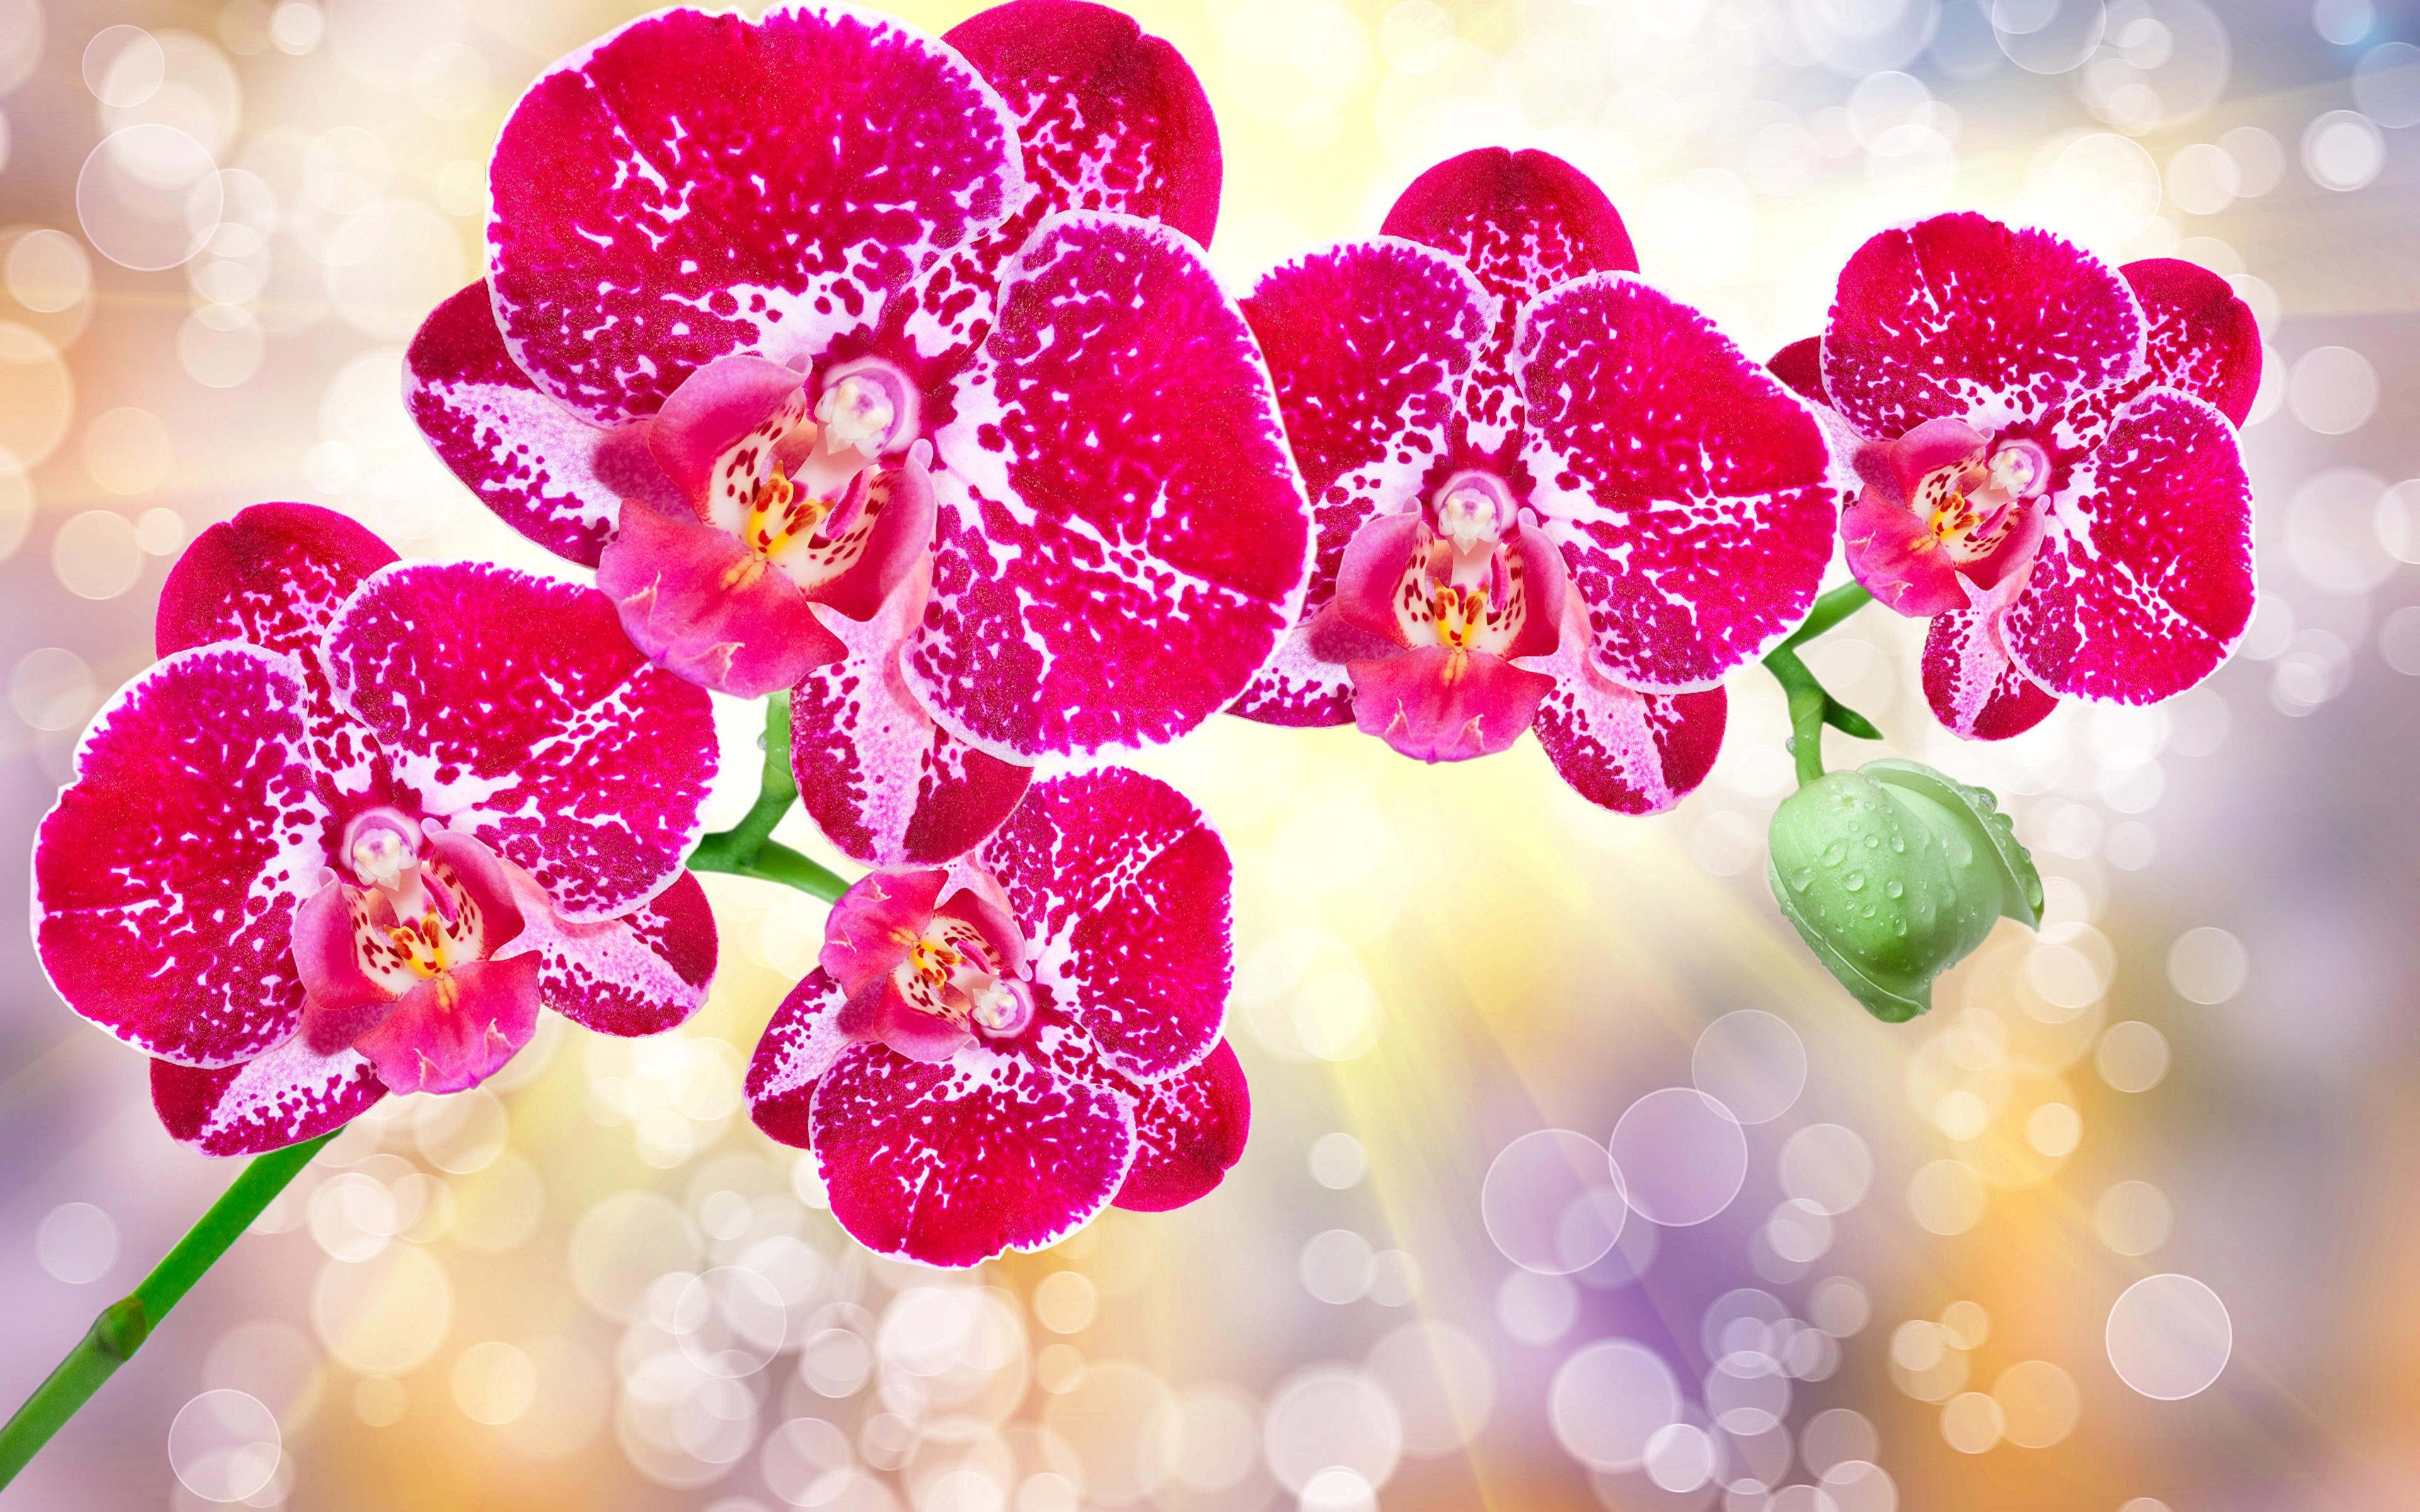 Fonds D Ecran 3840x2400 Orchidees En Gros Plan Rouge Fleurs